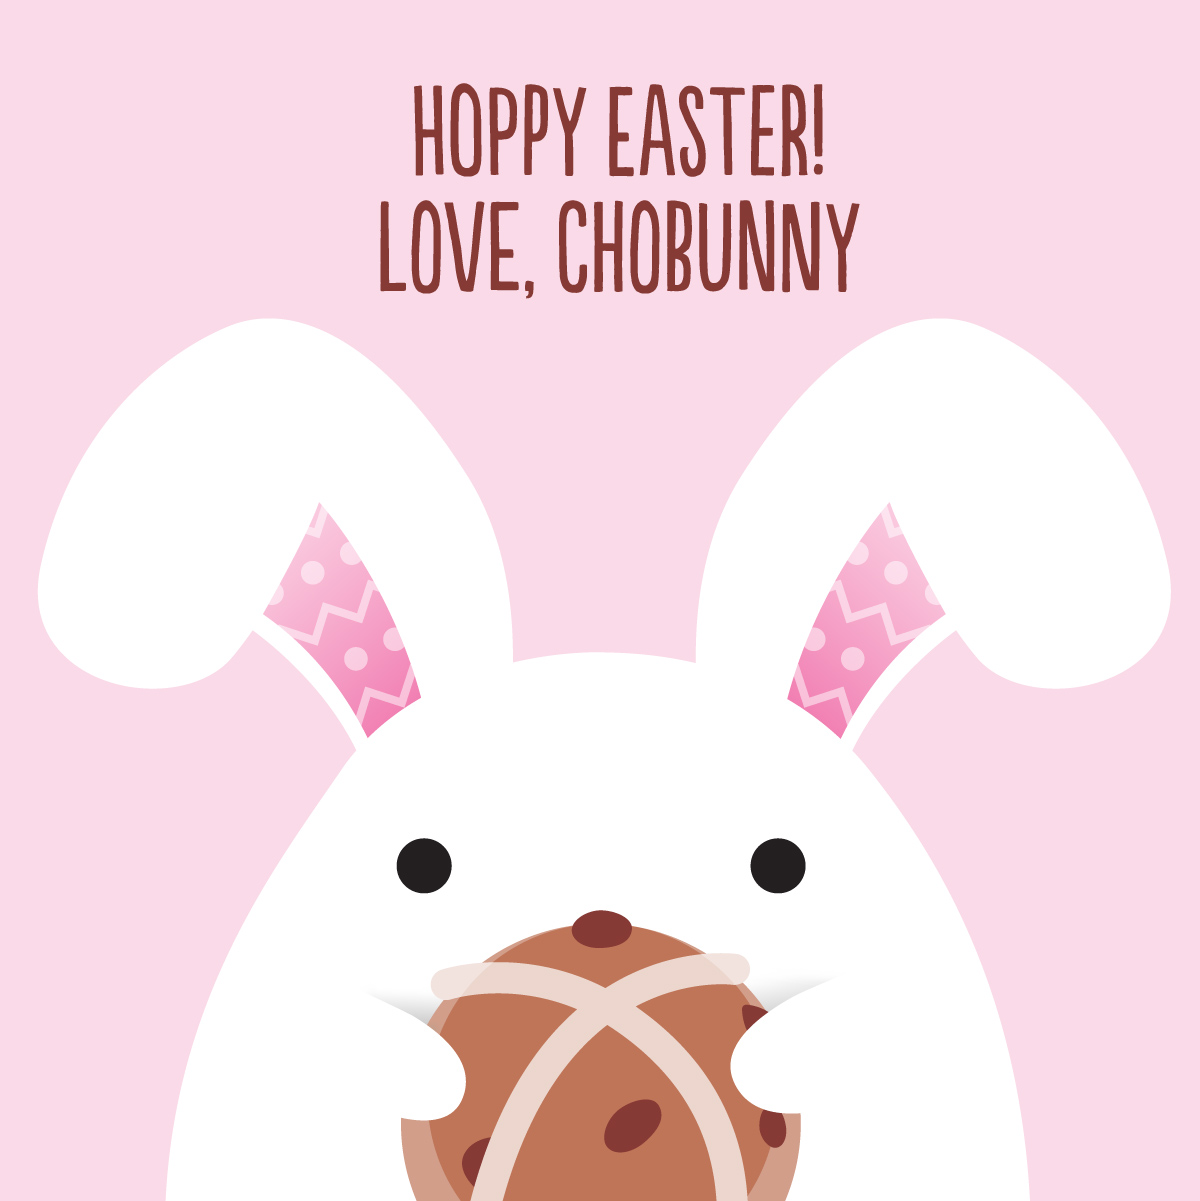 Chobani Chobunny Easter Flip Hot Cross Bun Illustration Copywriting